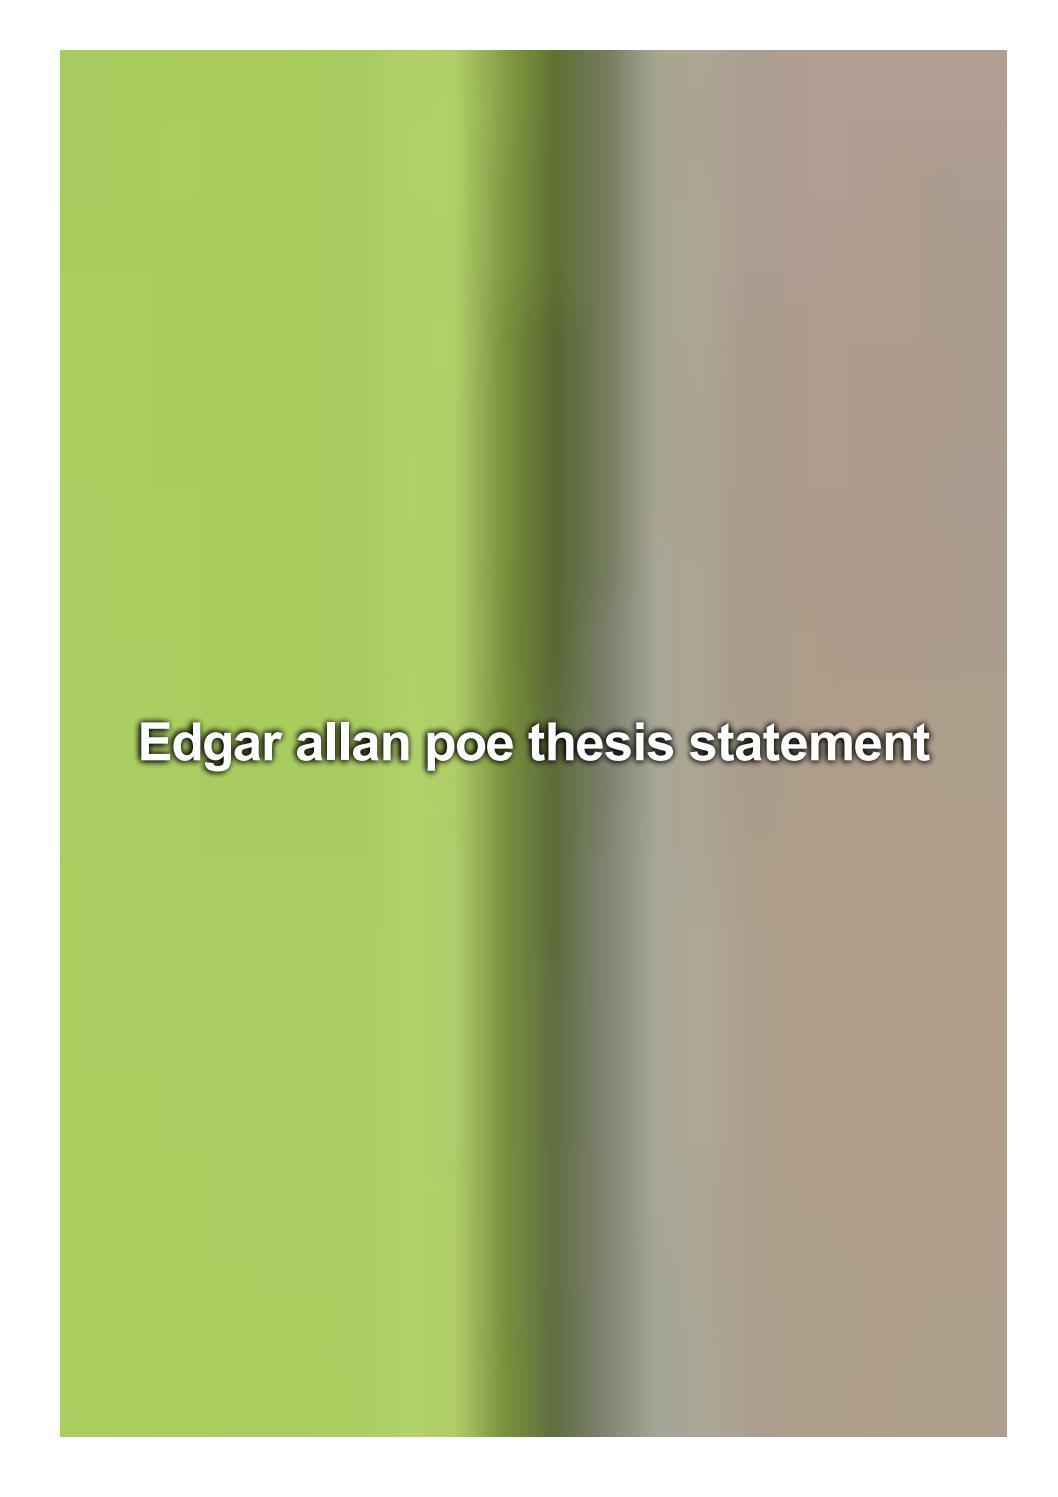 edgar allan poe thesis statements